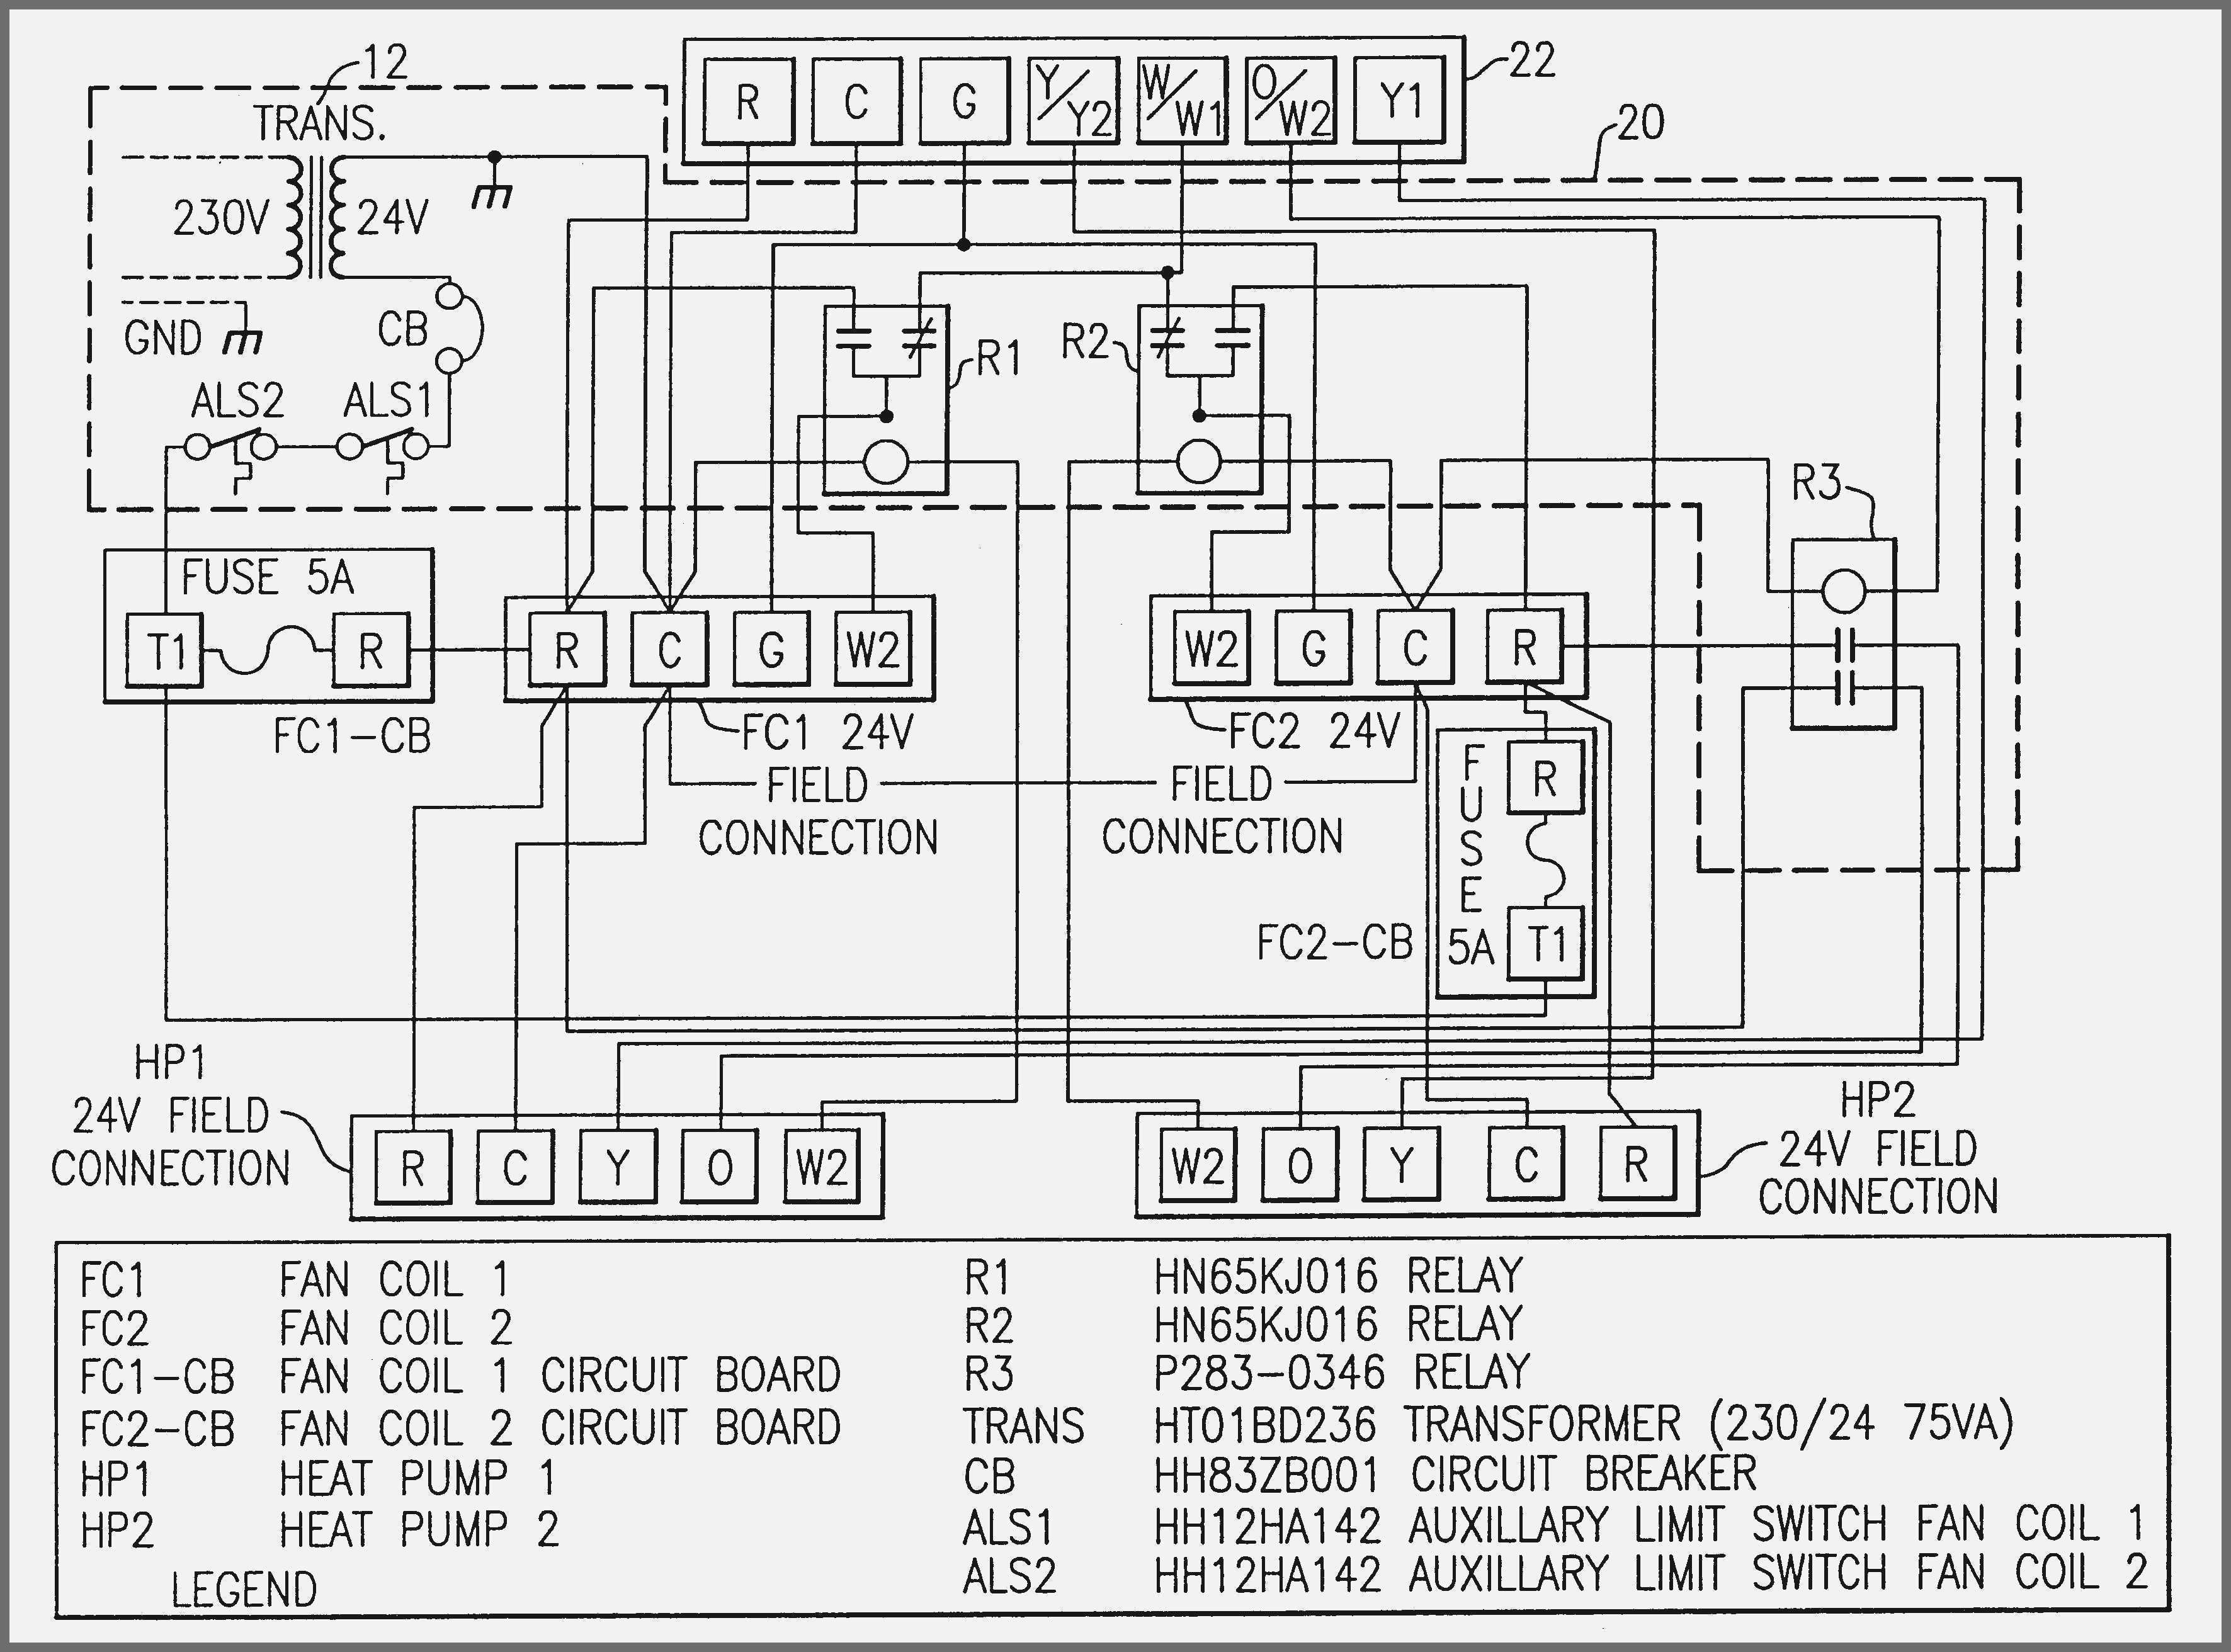 Heat Tape Roof Fresh Electric Heat Strip Wiring Diagram Best York 96 - Electric Heat Strip Wiring Diagram